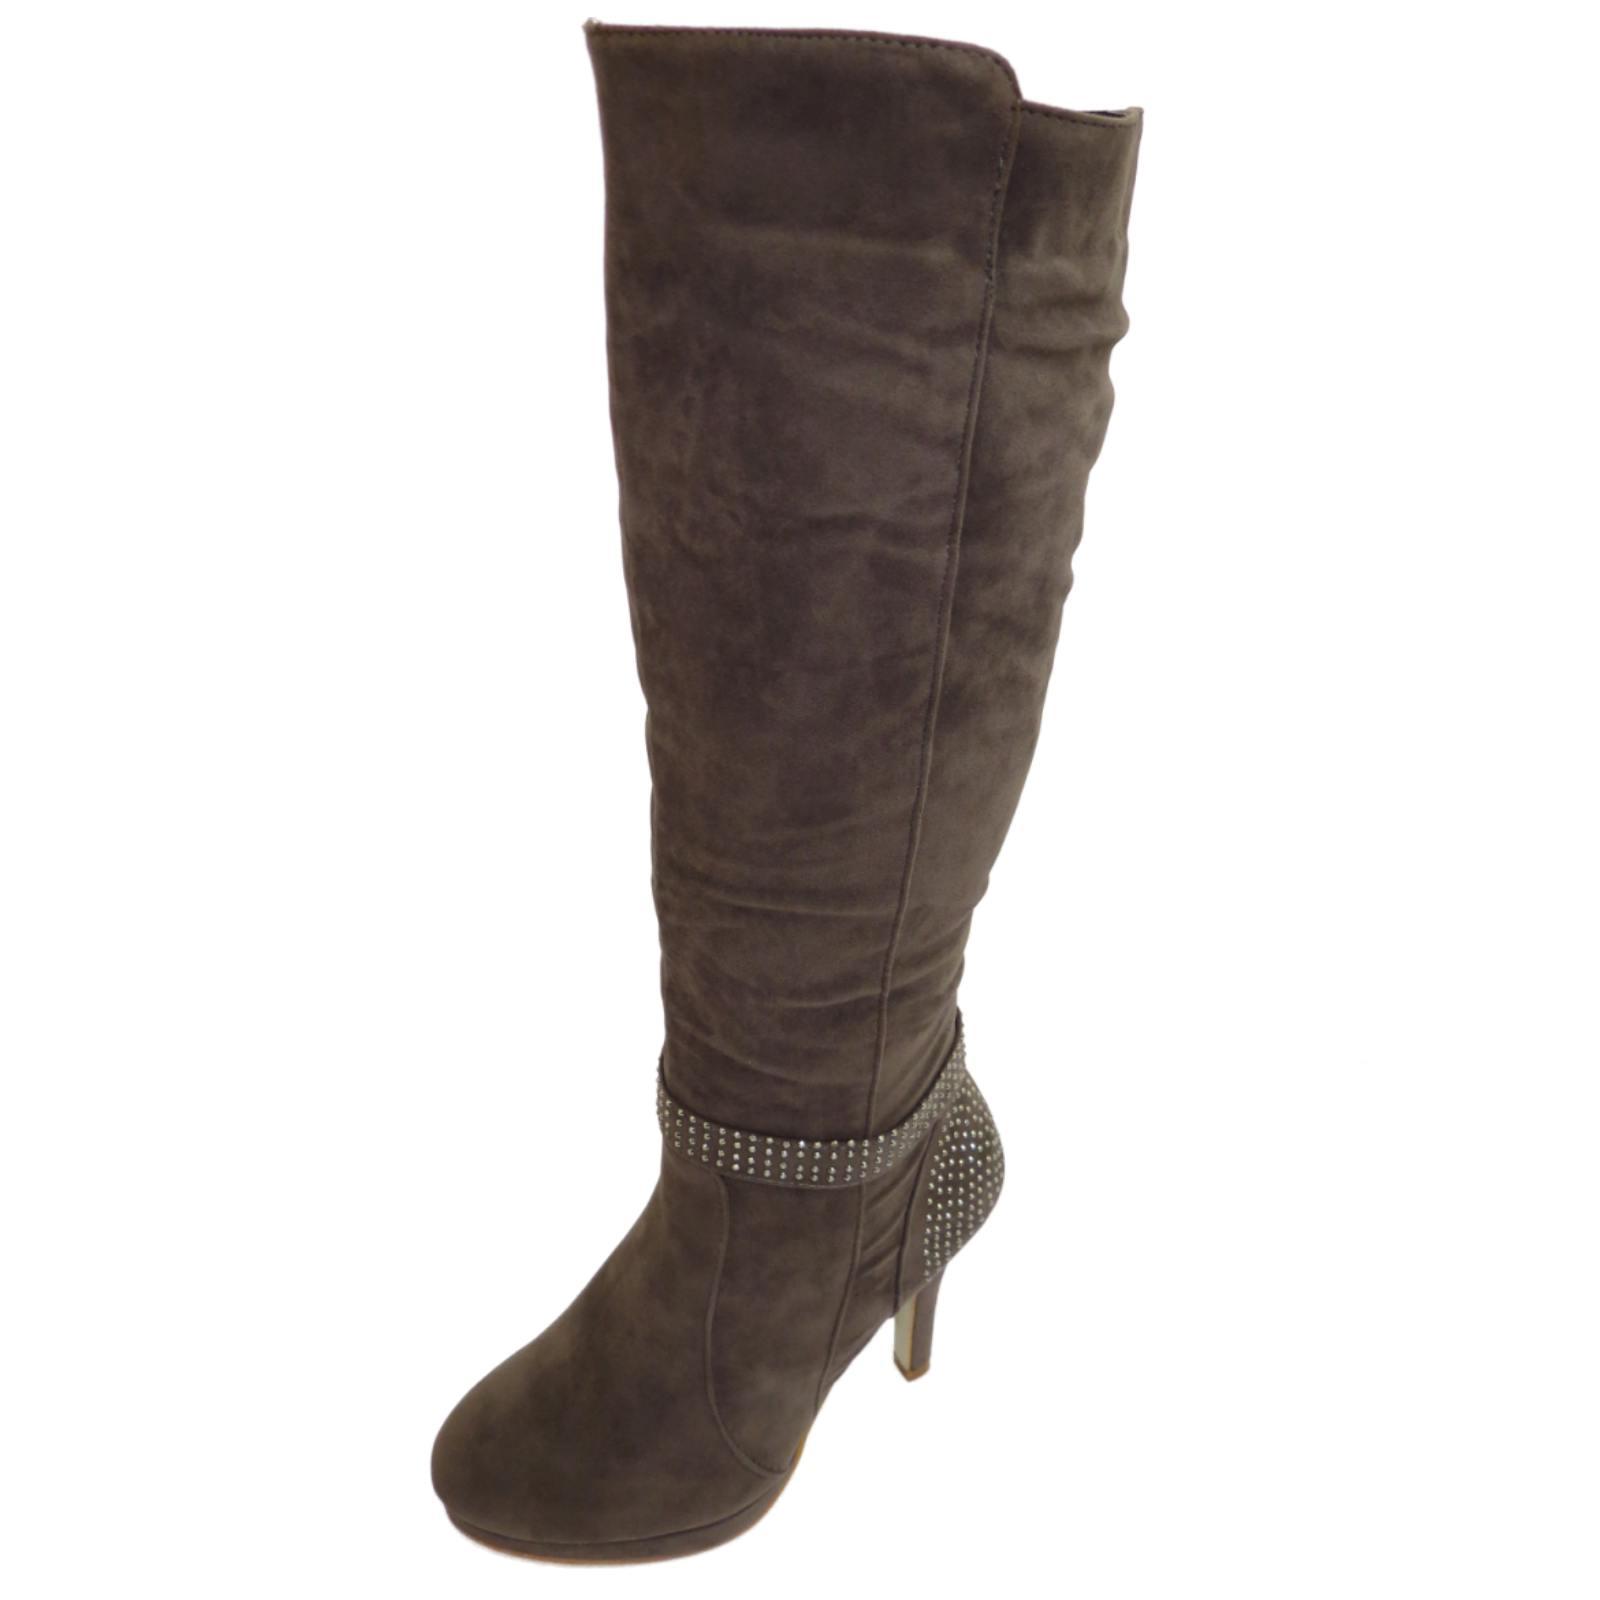 faux suede high heel knee high grey fashion